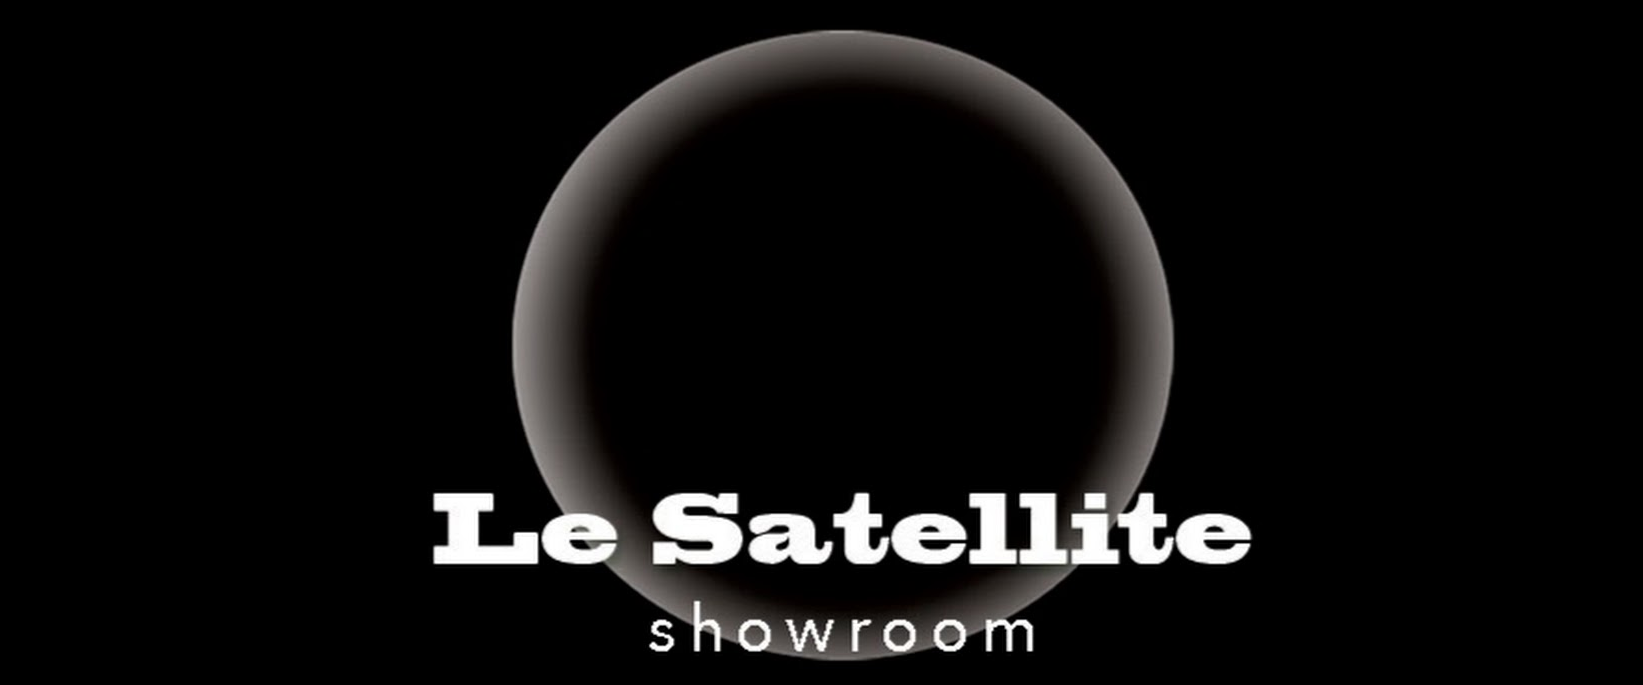 Showroom Le Satellite